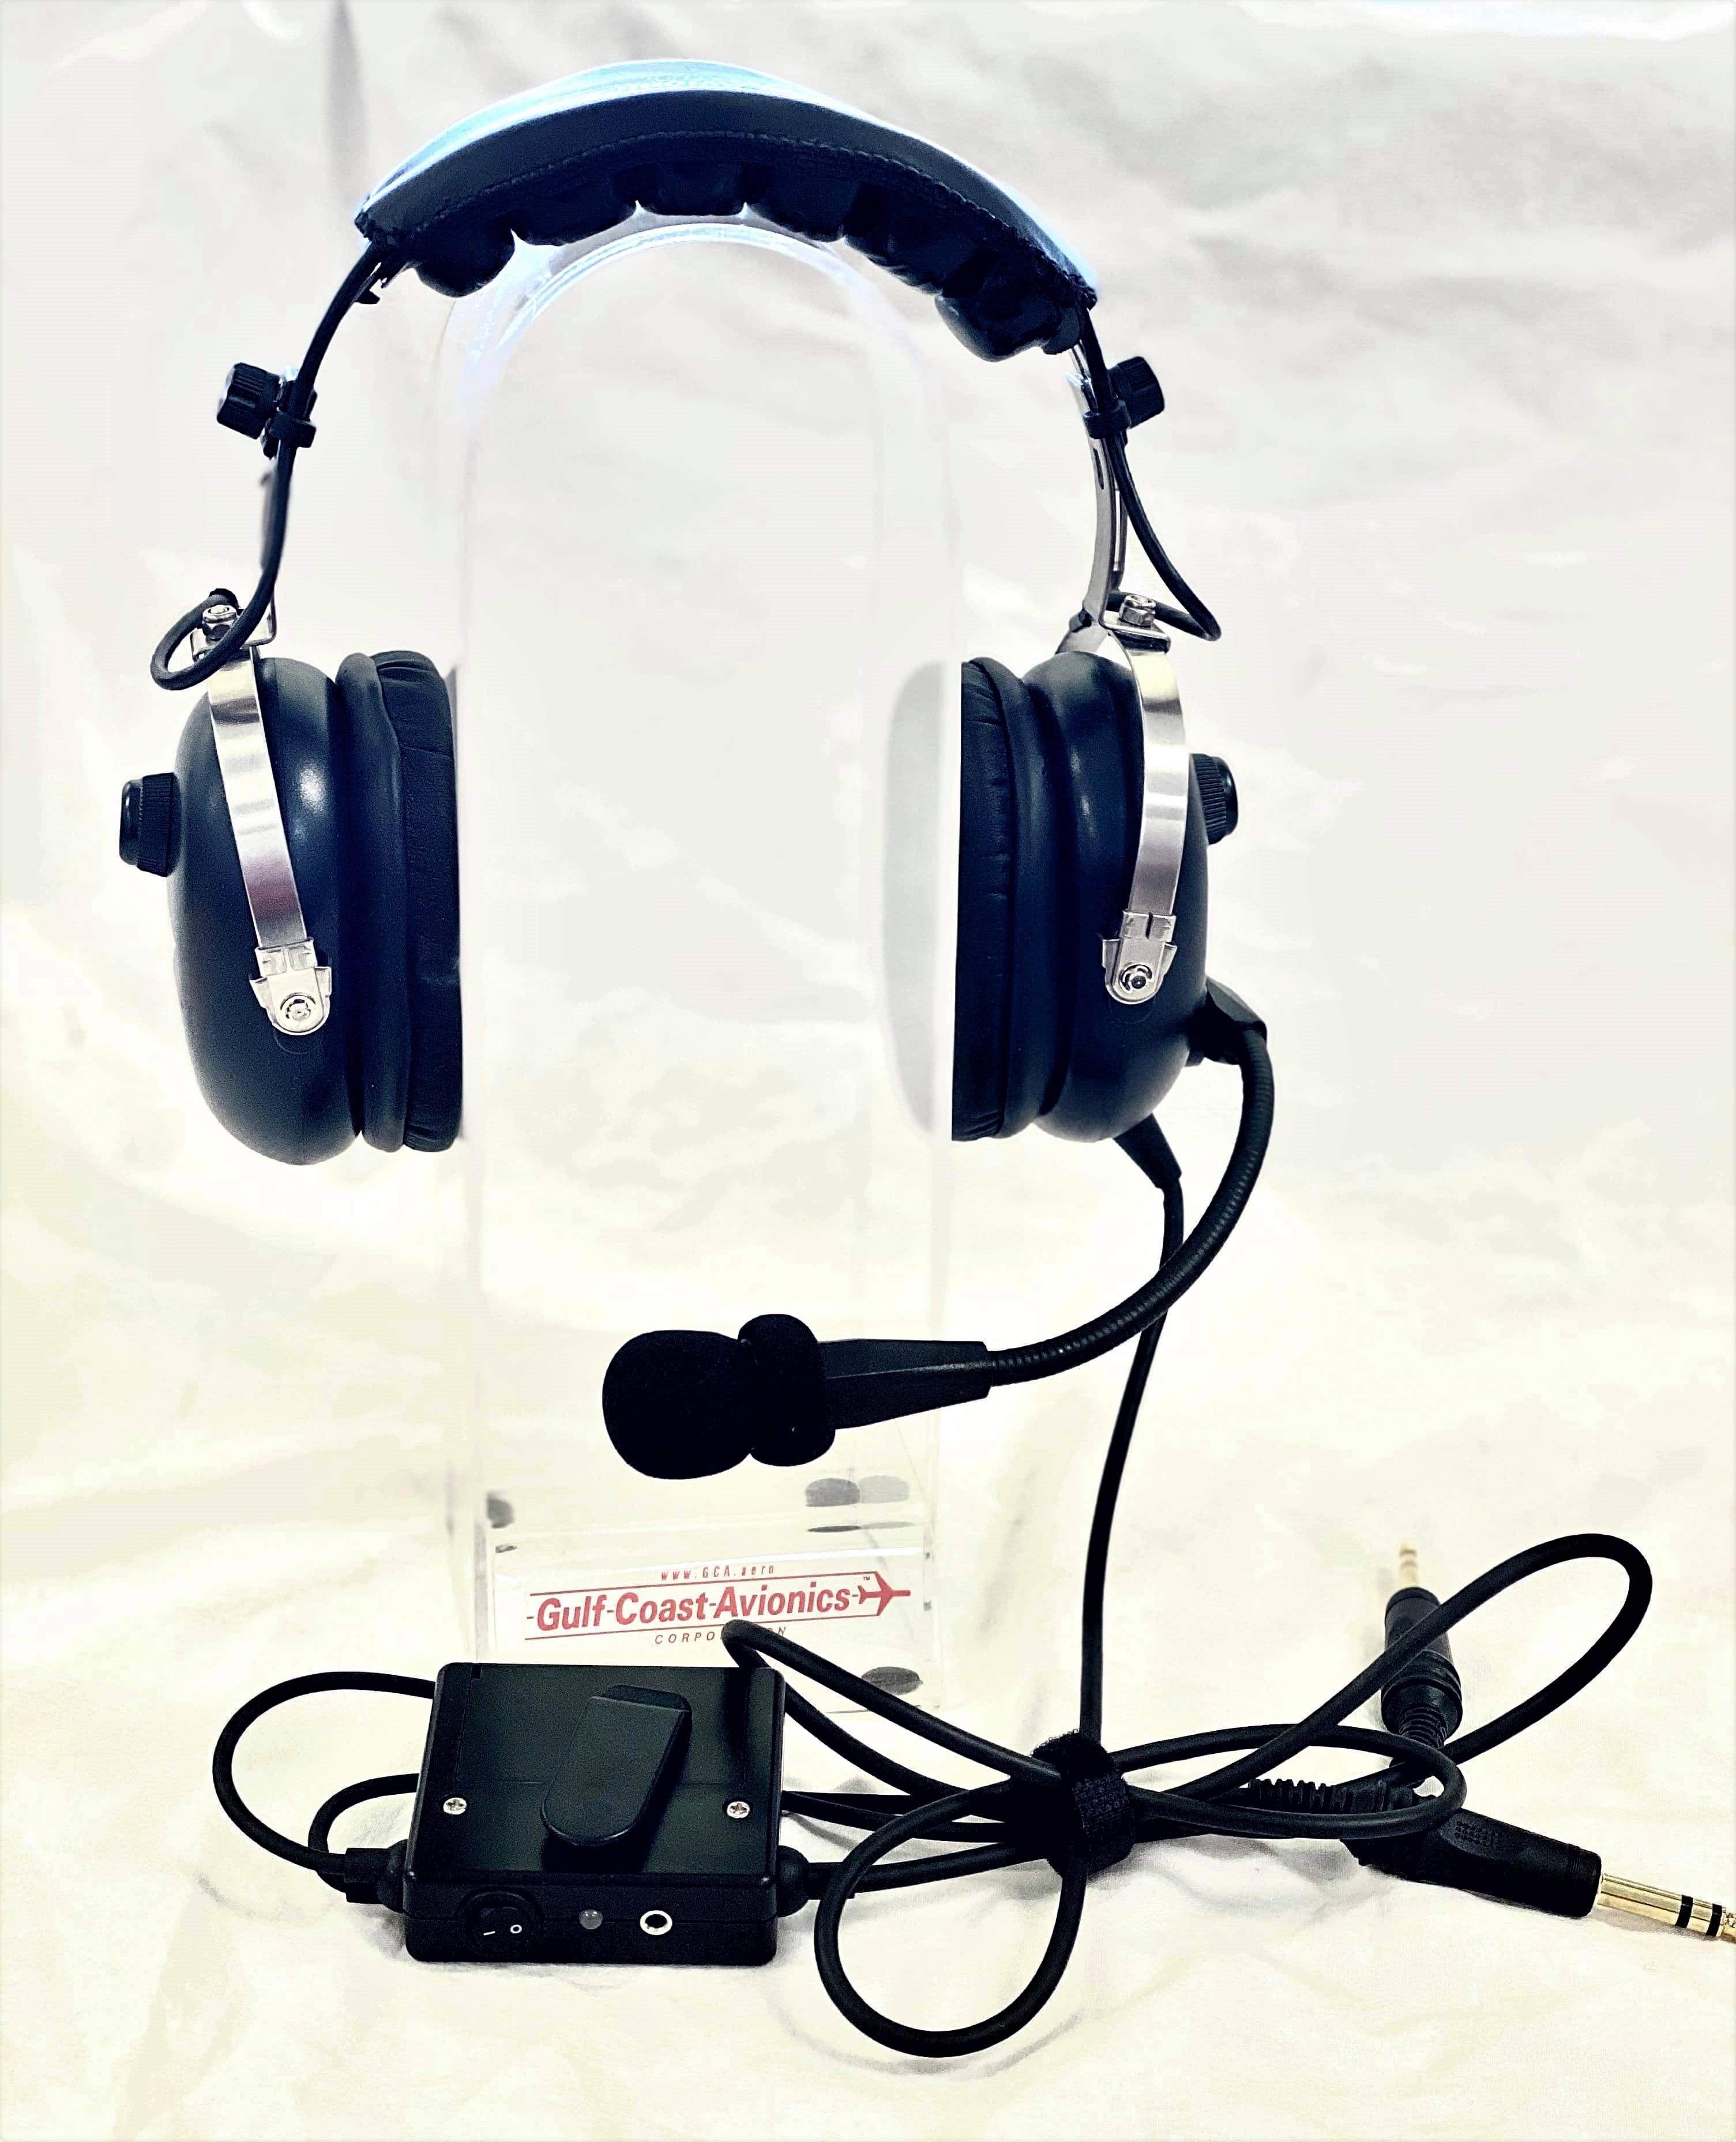 USED GCA Stereo/Mono ANR Headset